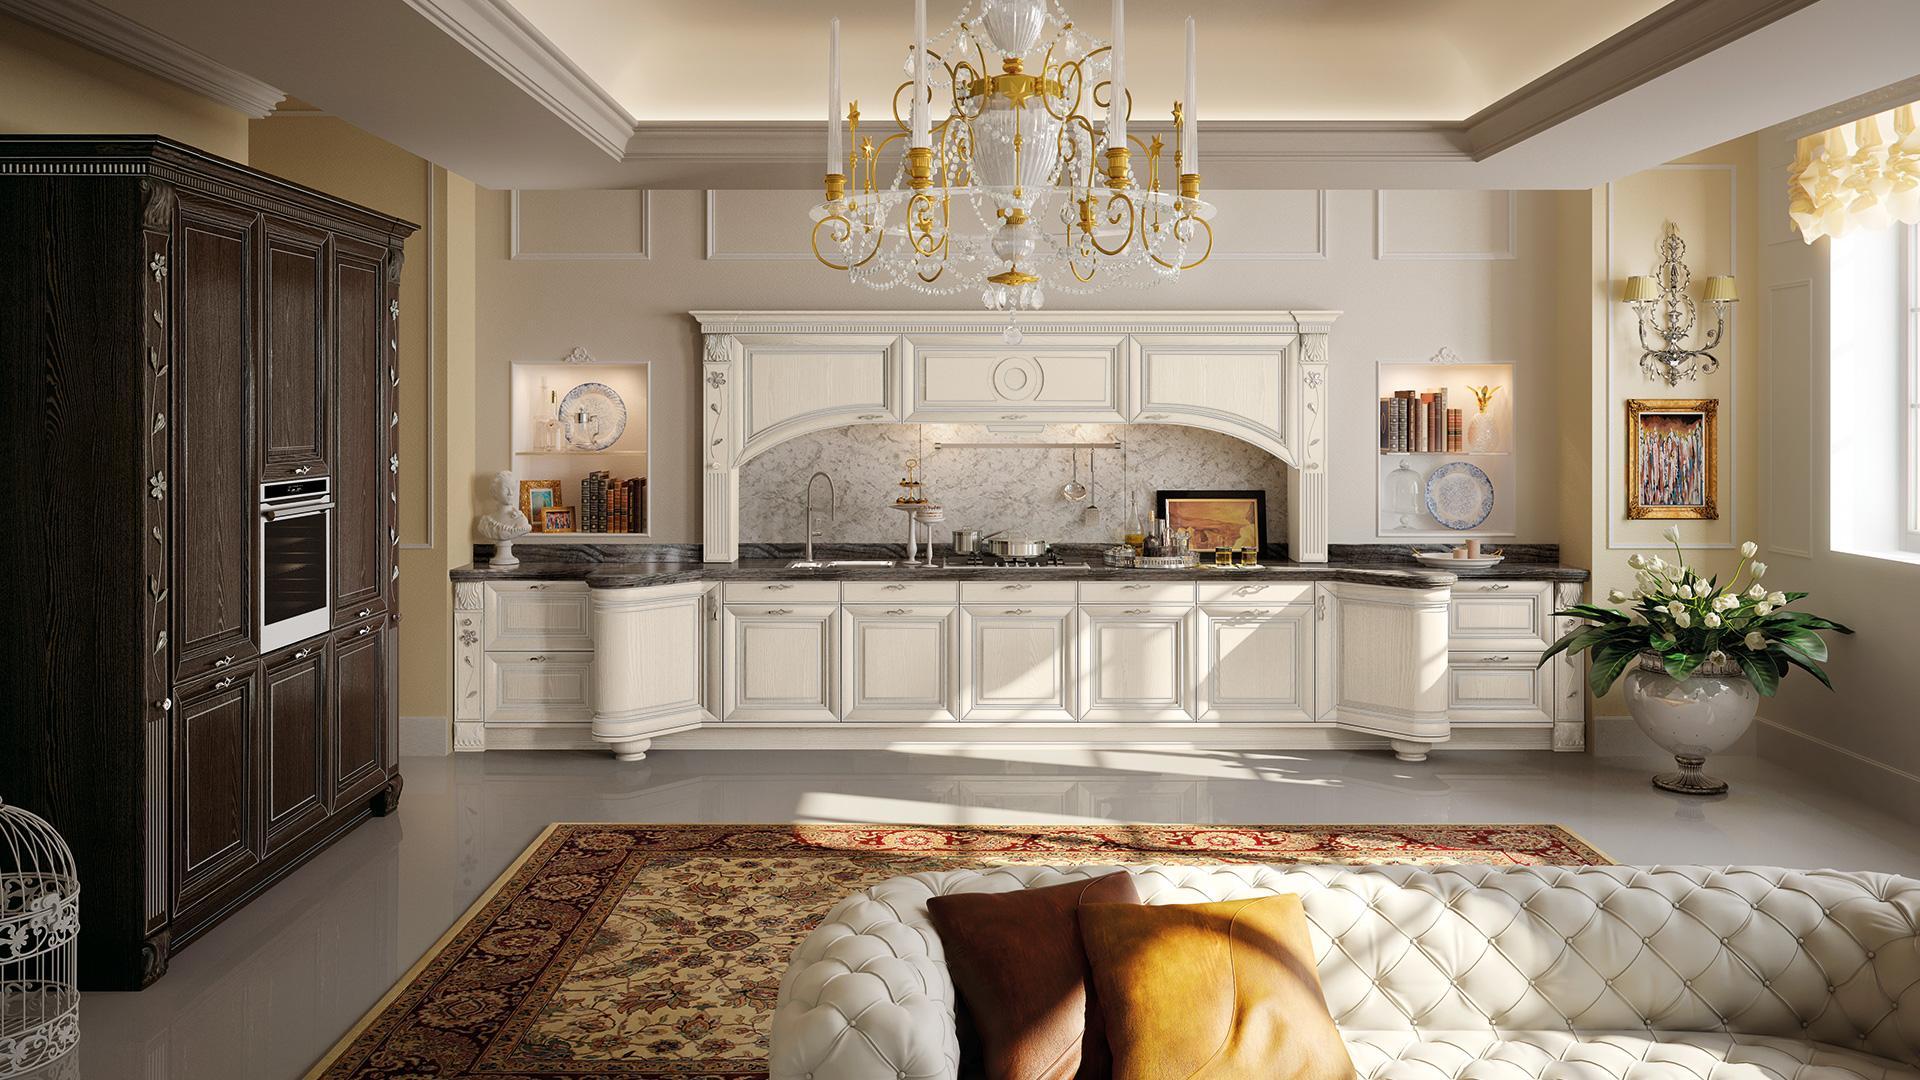 Cucina pantheon lube creo store corsico viale italia 22 for Aurelia arredamenti